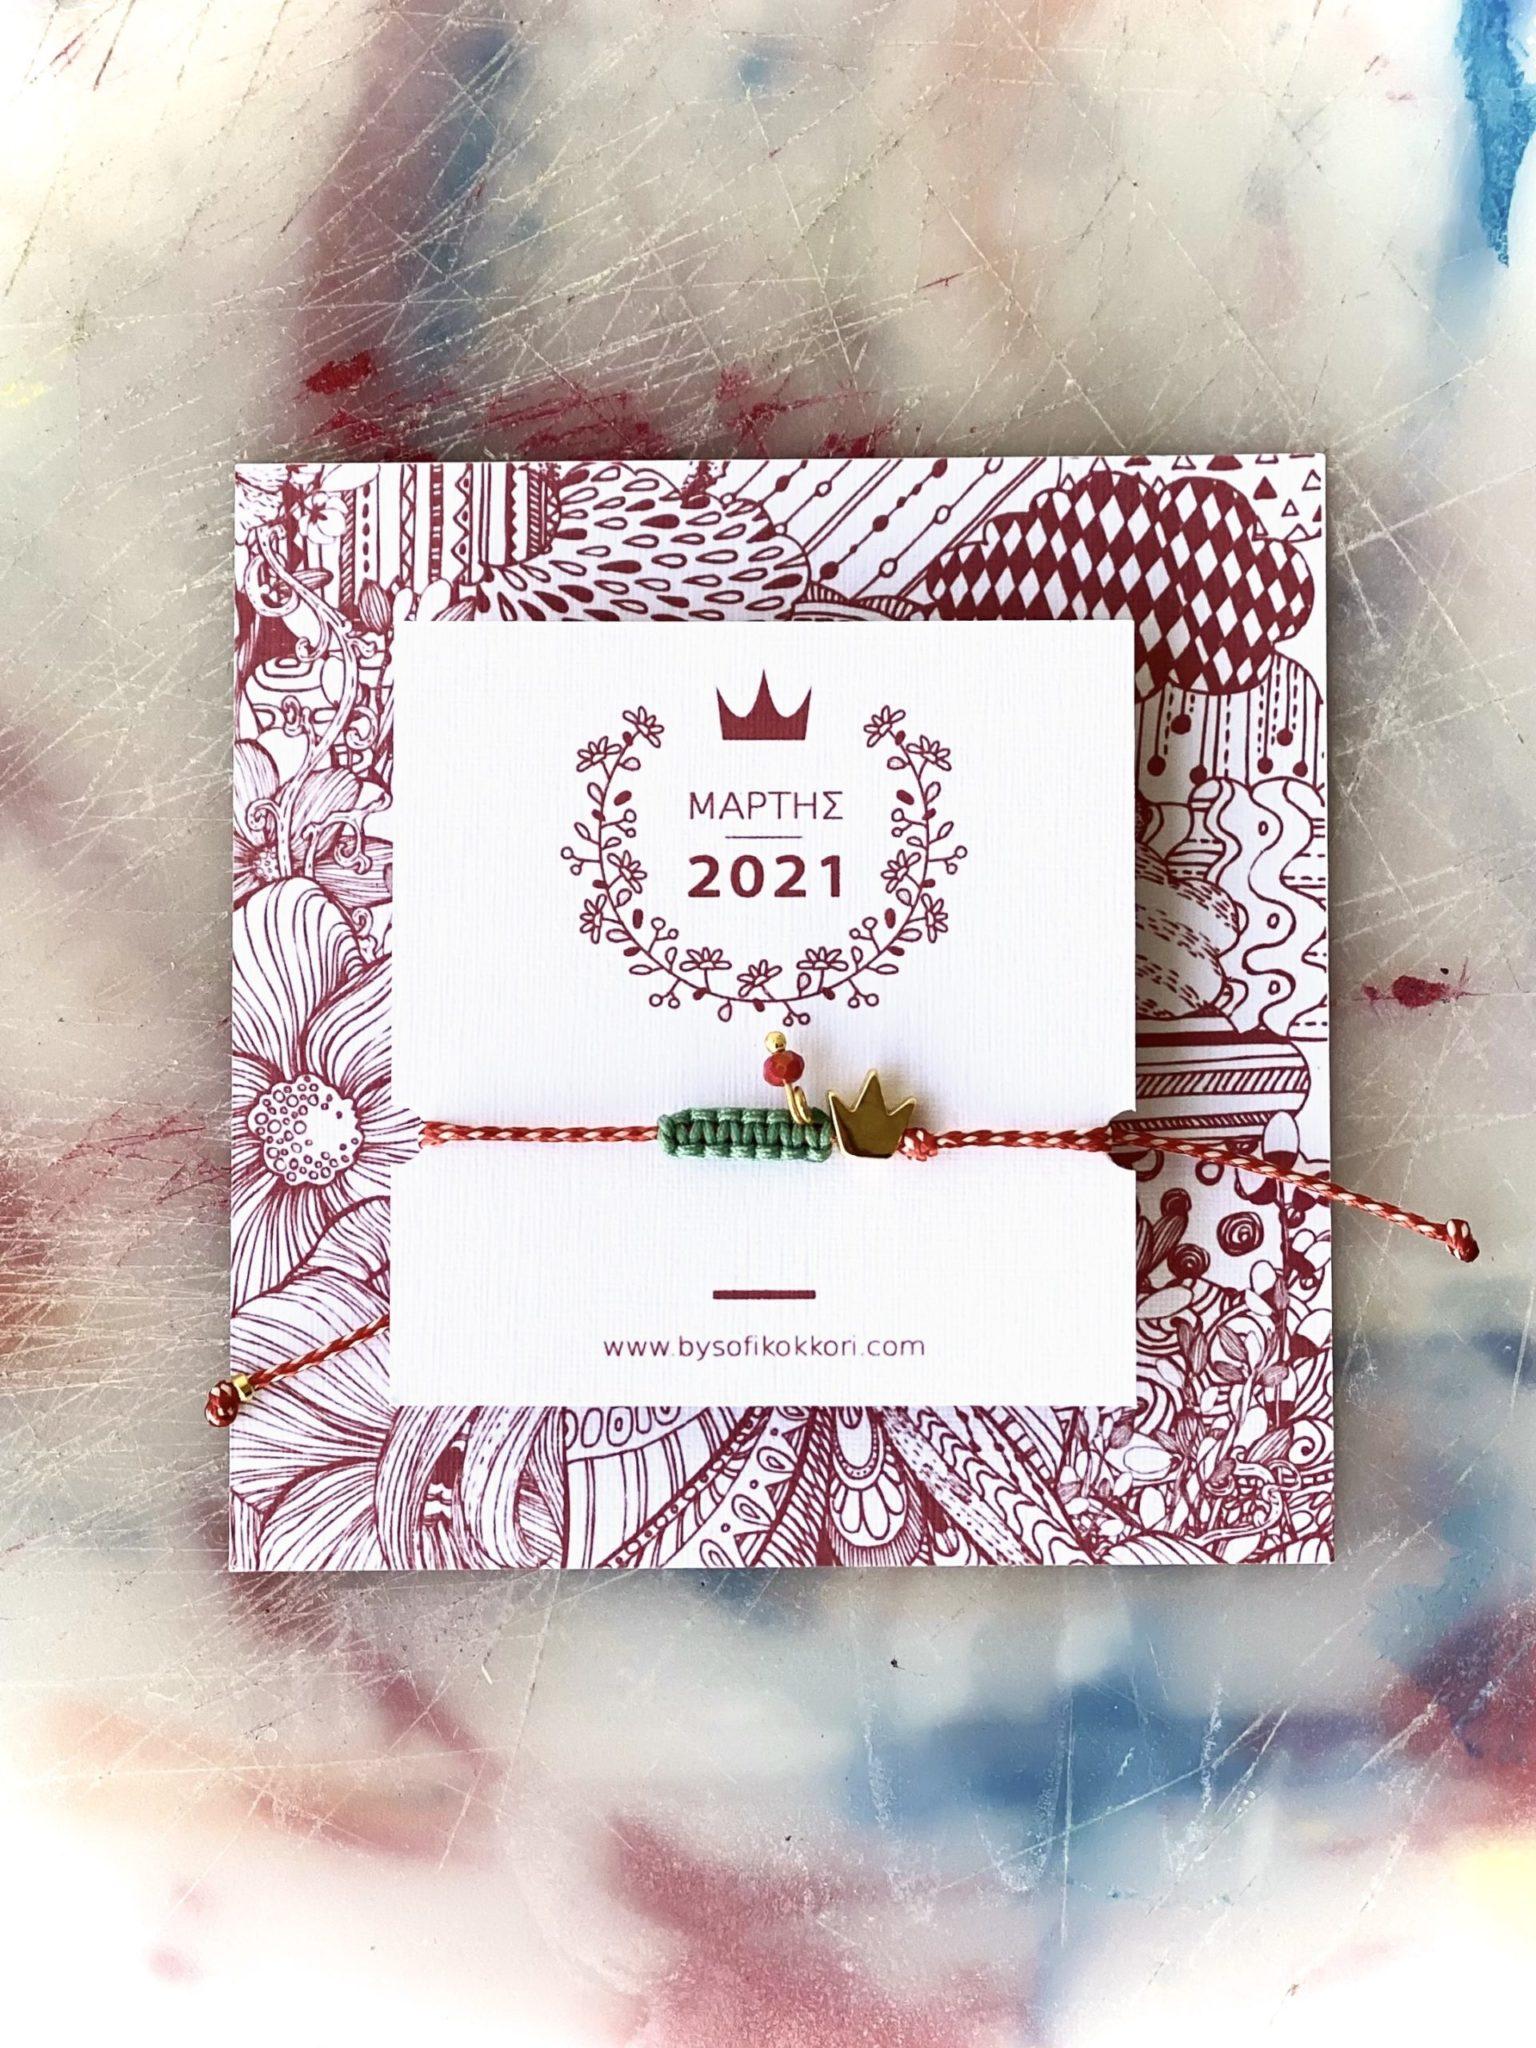 Martis-2021-special-occasion-crown-bracelet-macrame-petrol